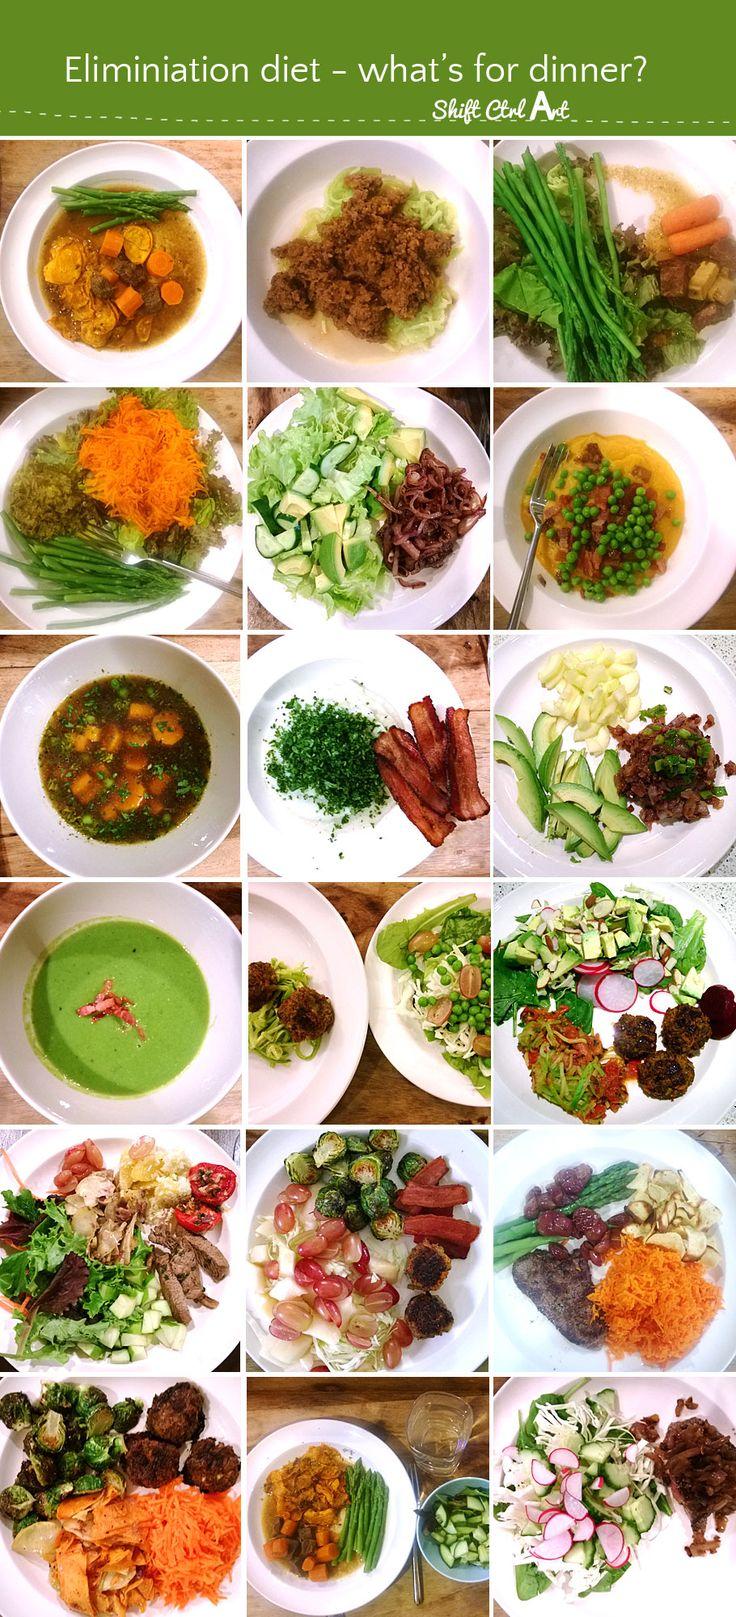 Eliminiation diet whats for dinner